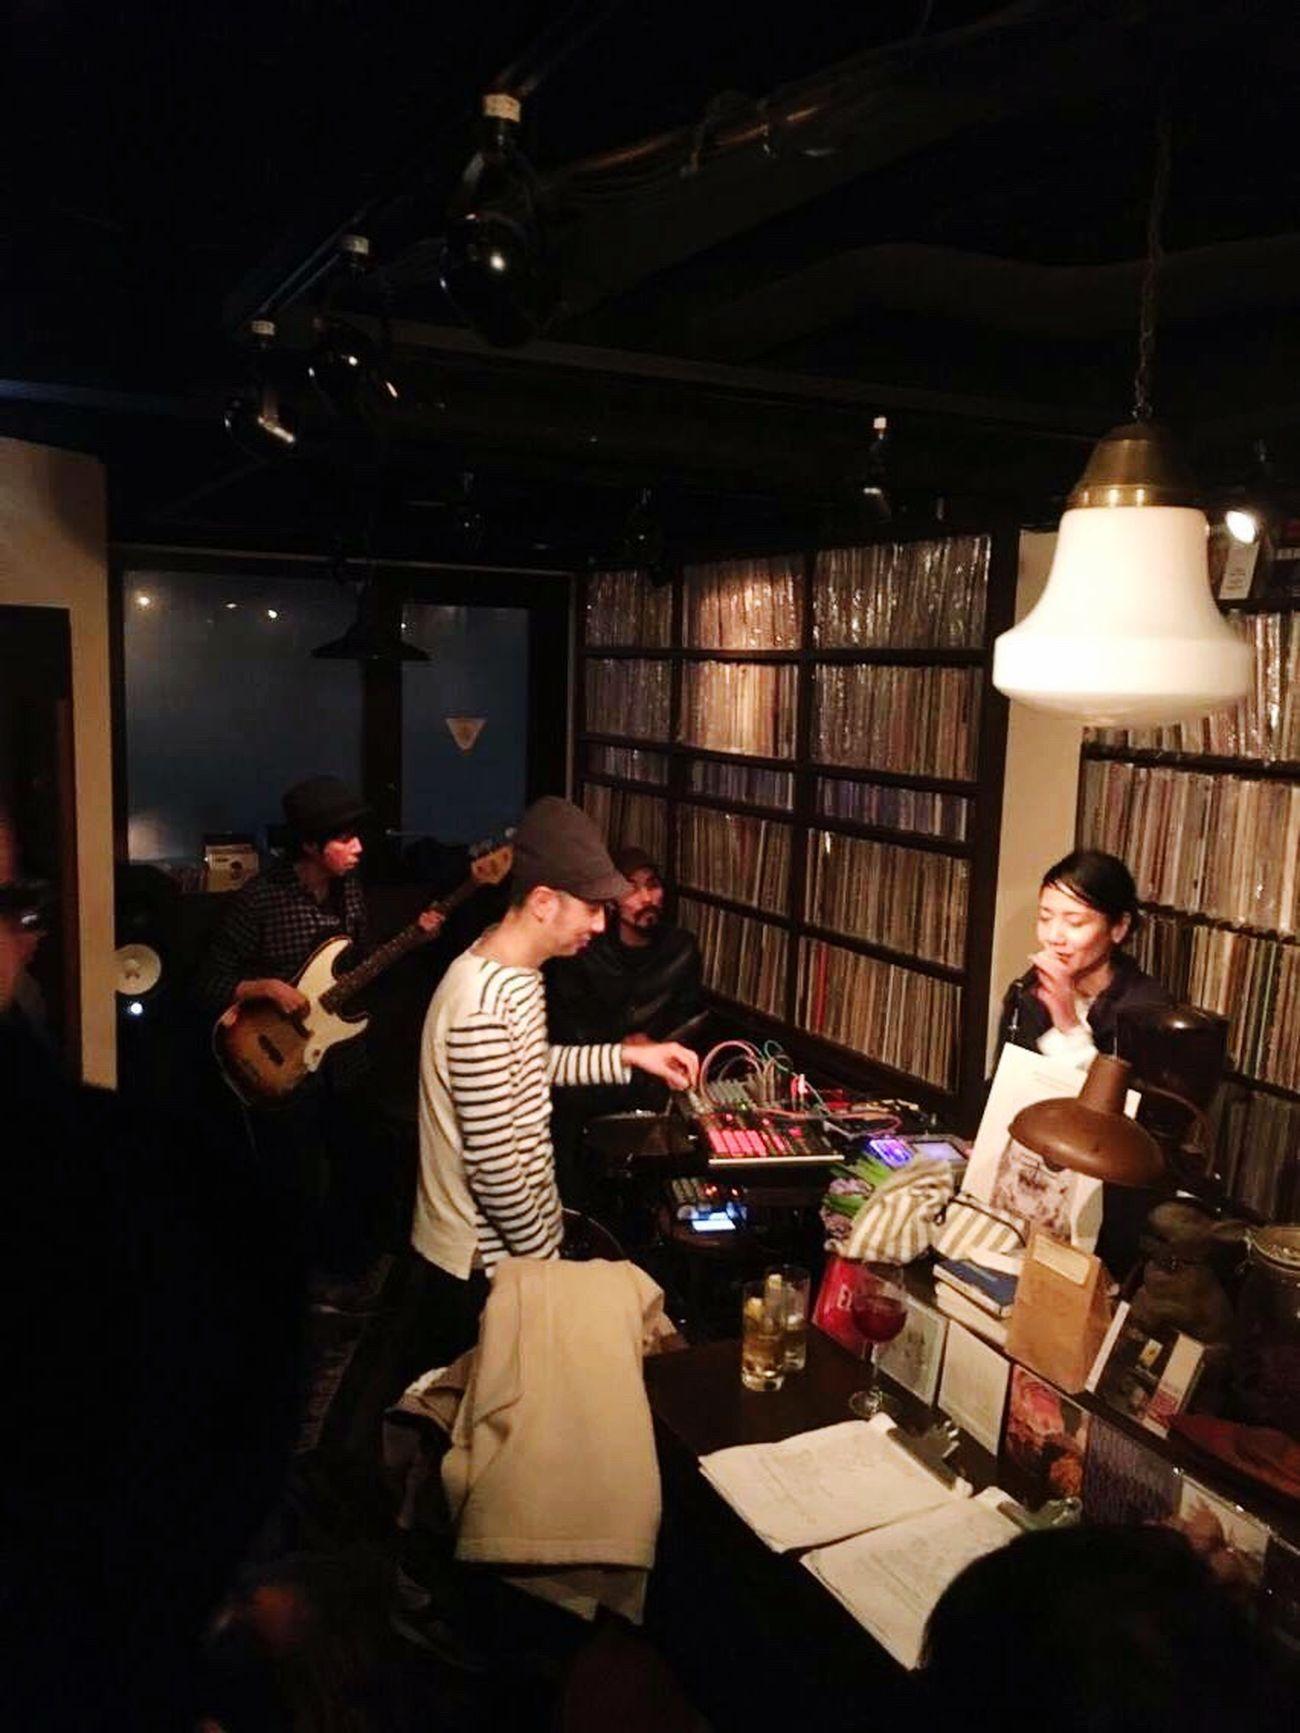 Today's live broadcasting was held in Shibuya Bar Music. It was wonderful night.昨夜のライブat 渋谷Bar Musicは素晴らしく楽しかった。曇りも、雨になり、帰る頃には雪に変わった東京。みんなありがとう。 Tokyo Shibuya Barmusic Scof75 Scof4 Studio75 Vinyl Thank you for coming! Please wait for a new album a moment.